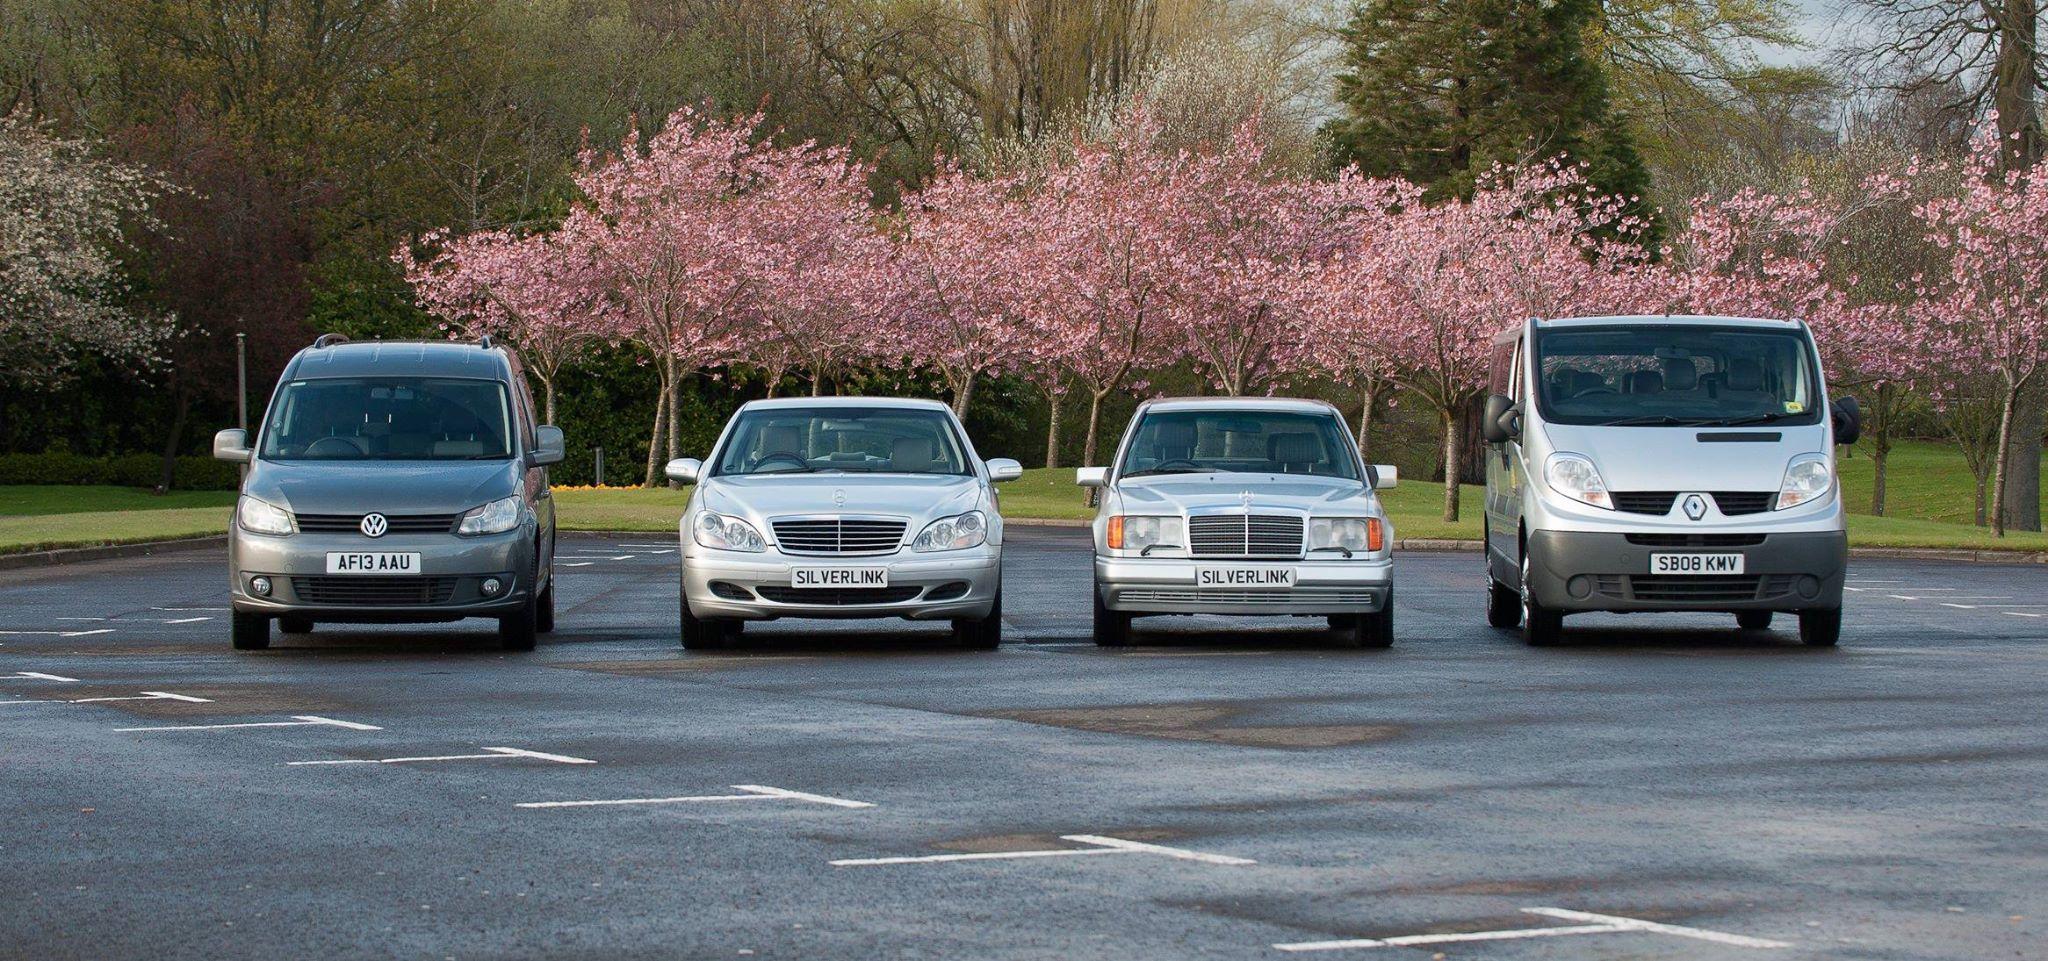 The Chauffeur Services Scotland Fleet